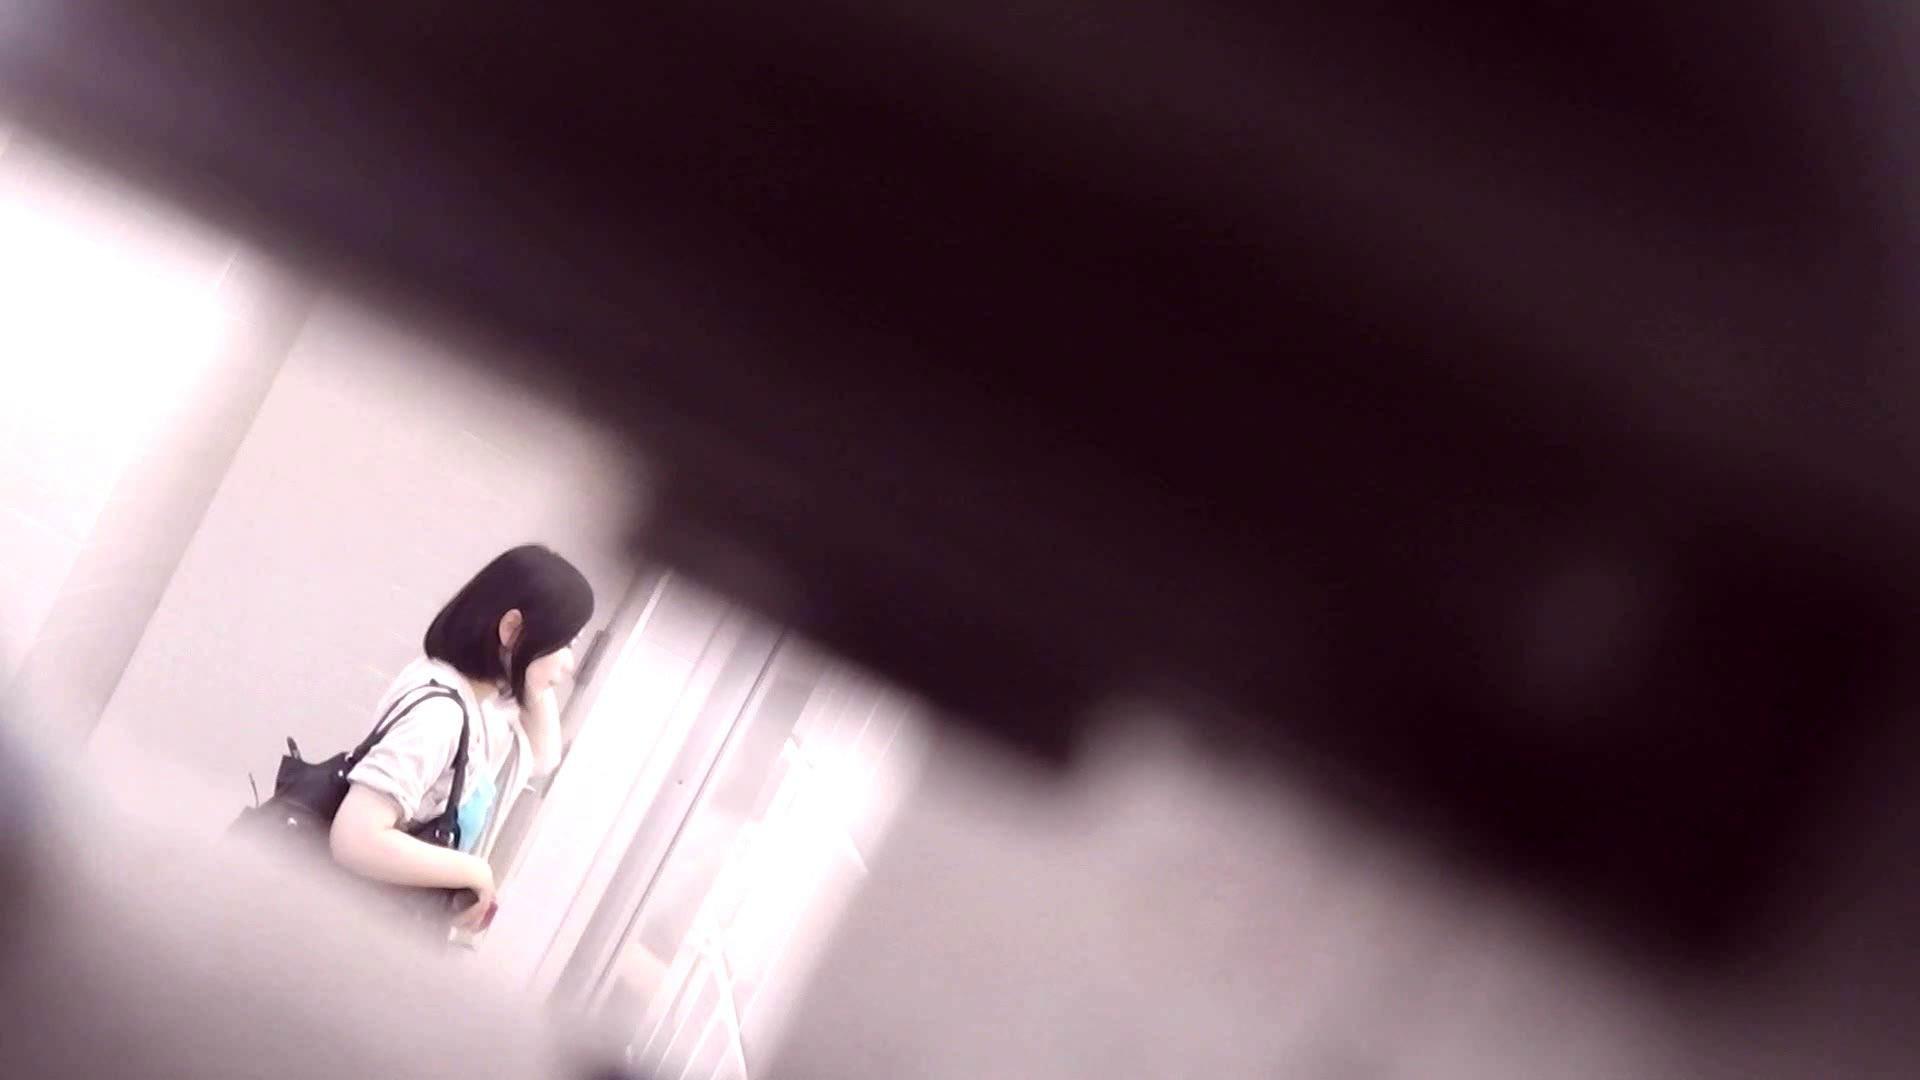 vol.16 命がけ潜伏洗面所! 美女たっぷり!! 独身エッチOL | 潜入プロ映像  28pic 14